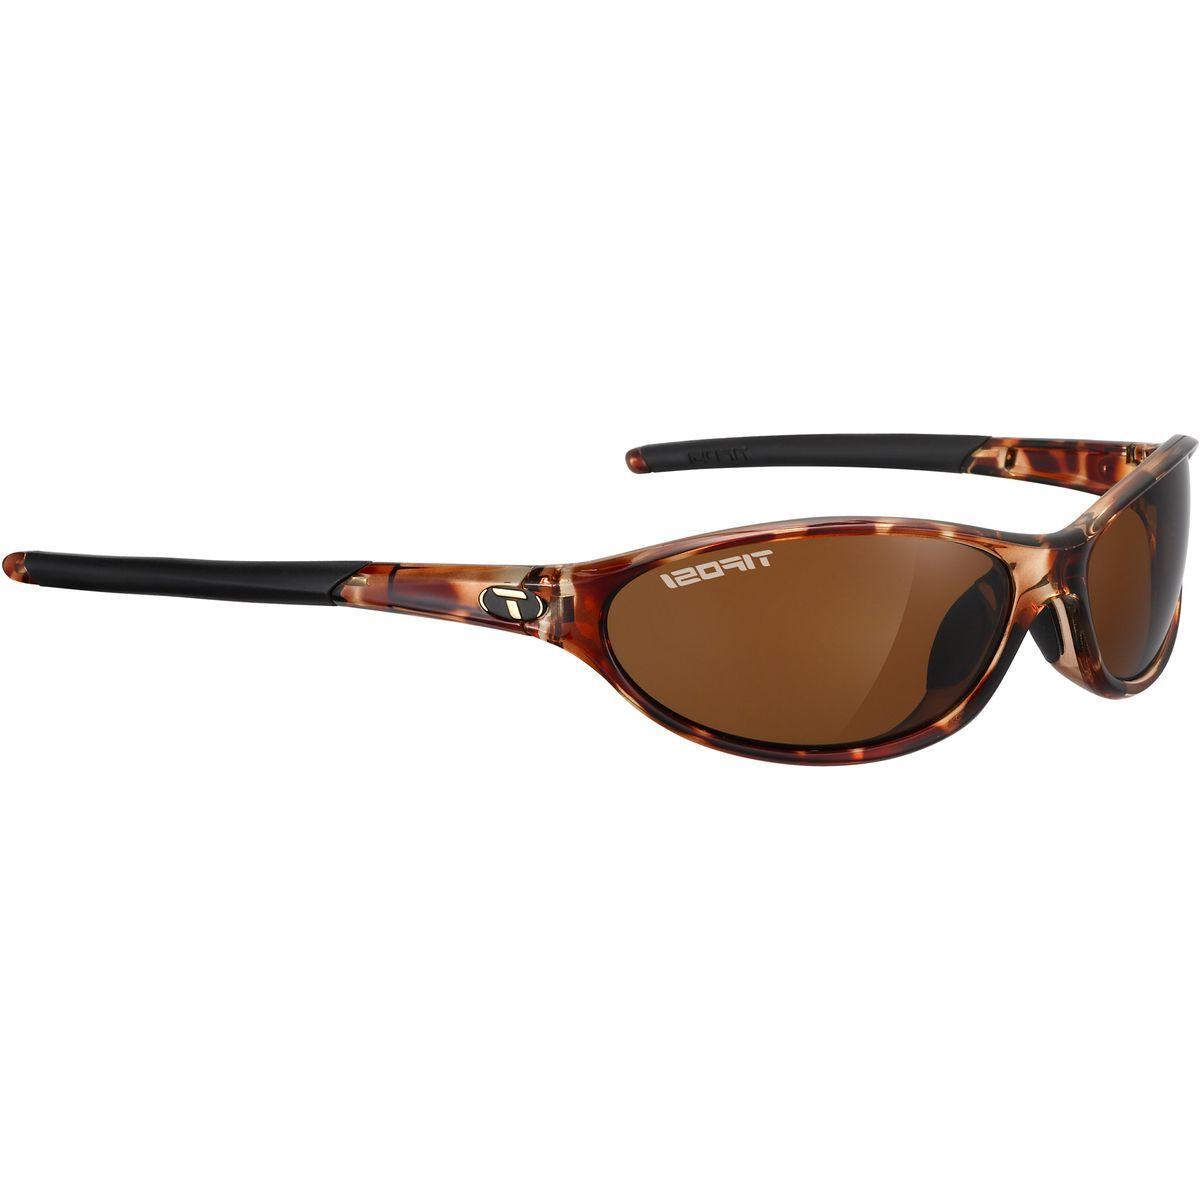 Tifosi Optics Alpe 2.0 Polarized Sunglasses - Women's